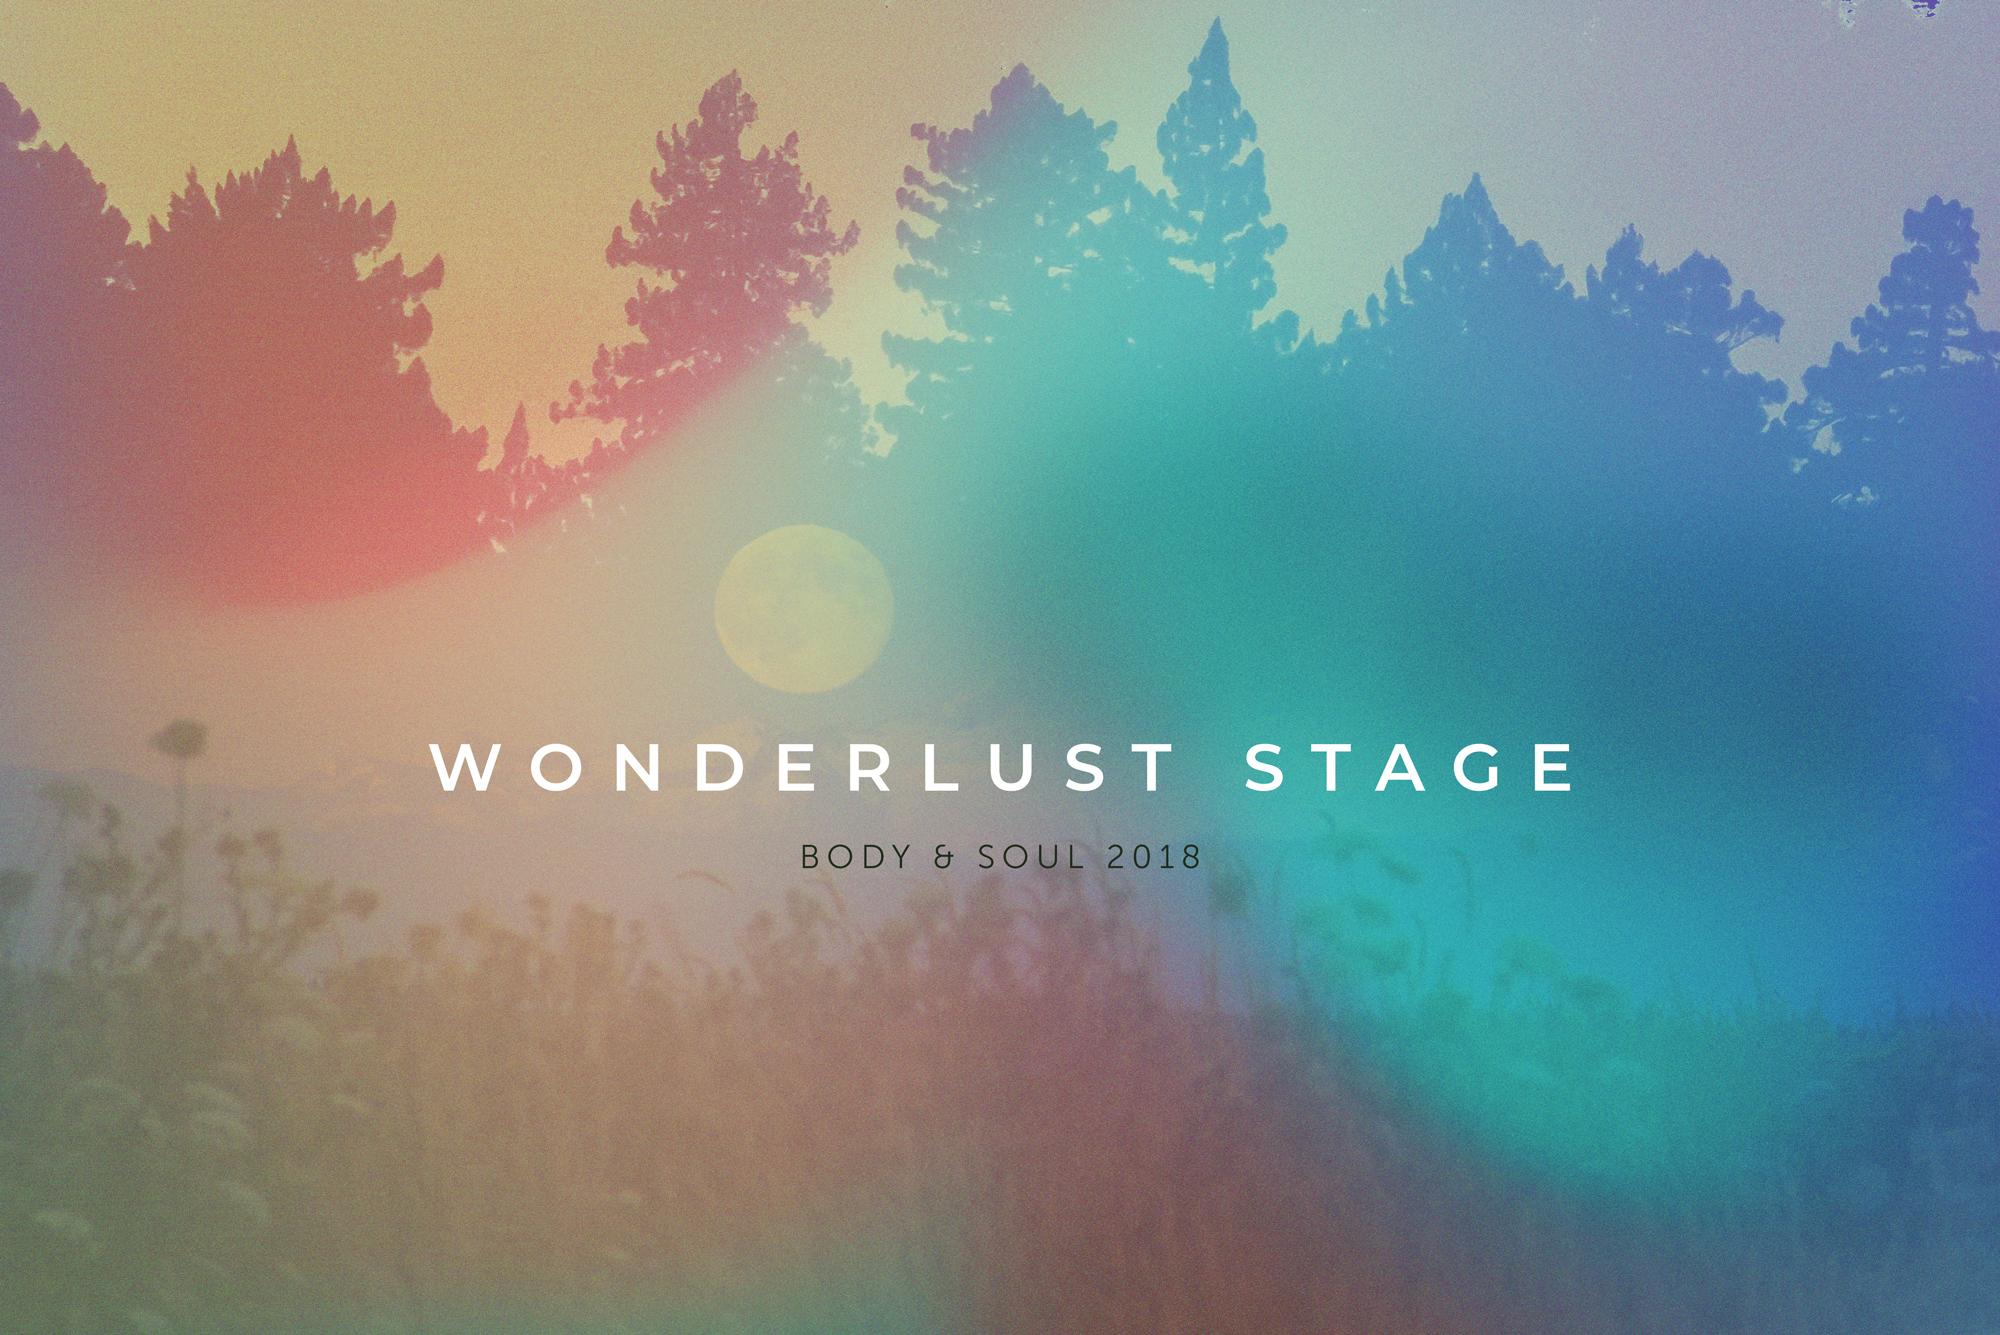 Wonderlust | Body & Soul